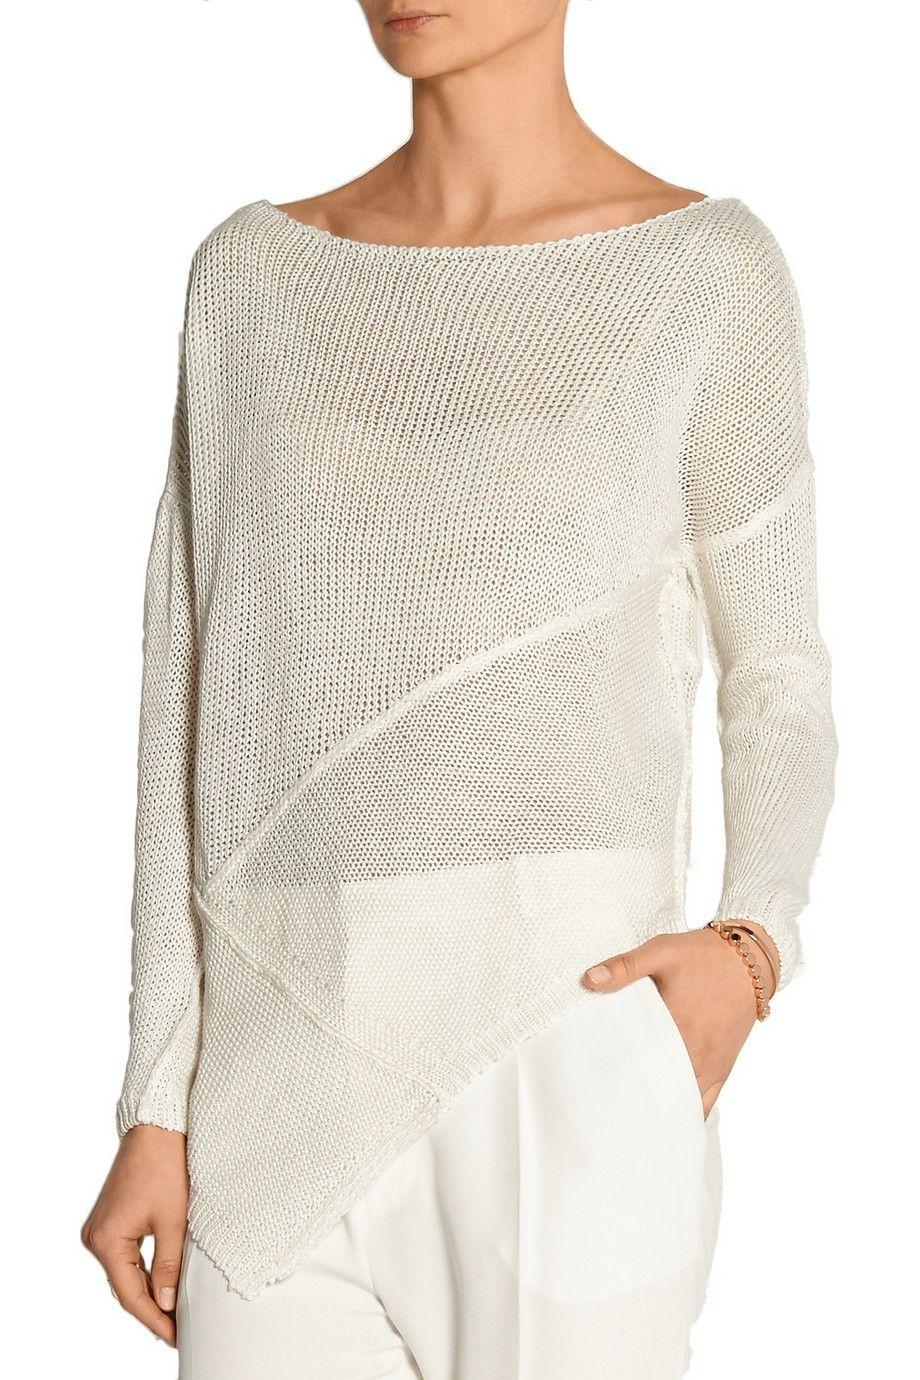 Donna Karan New YorkOpen-knit linen sweaterfront | Fashion ...